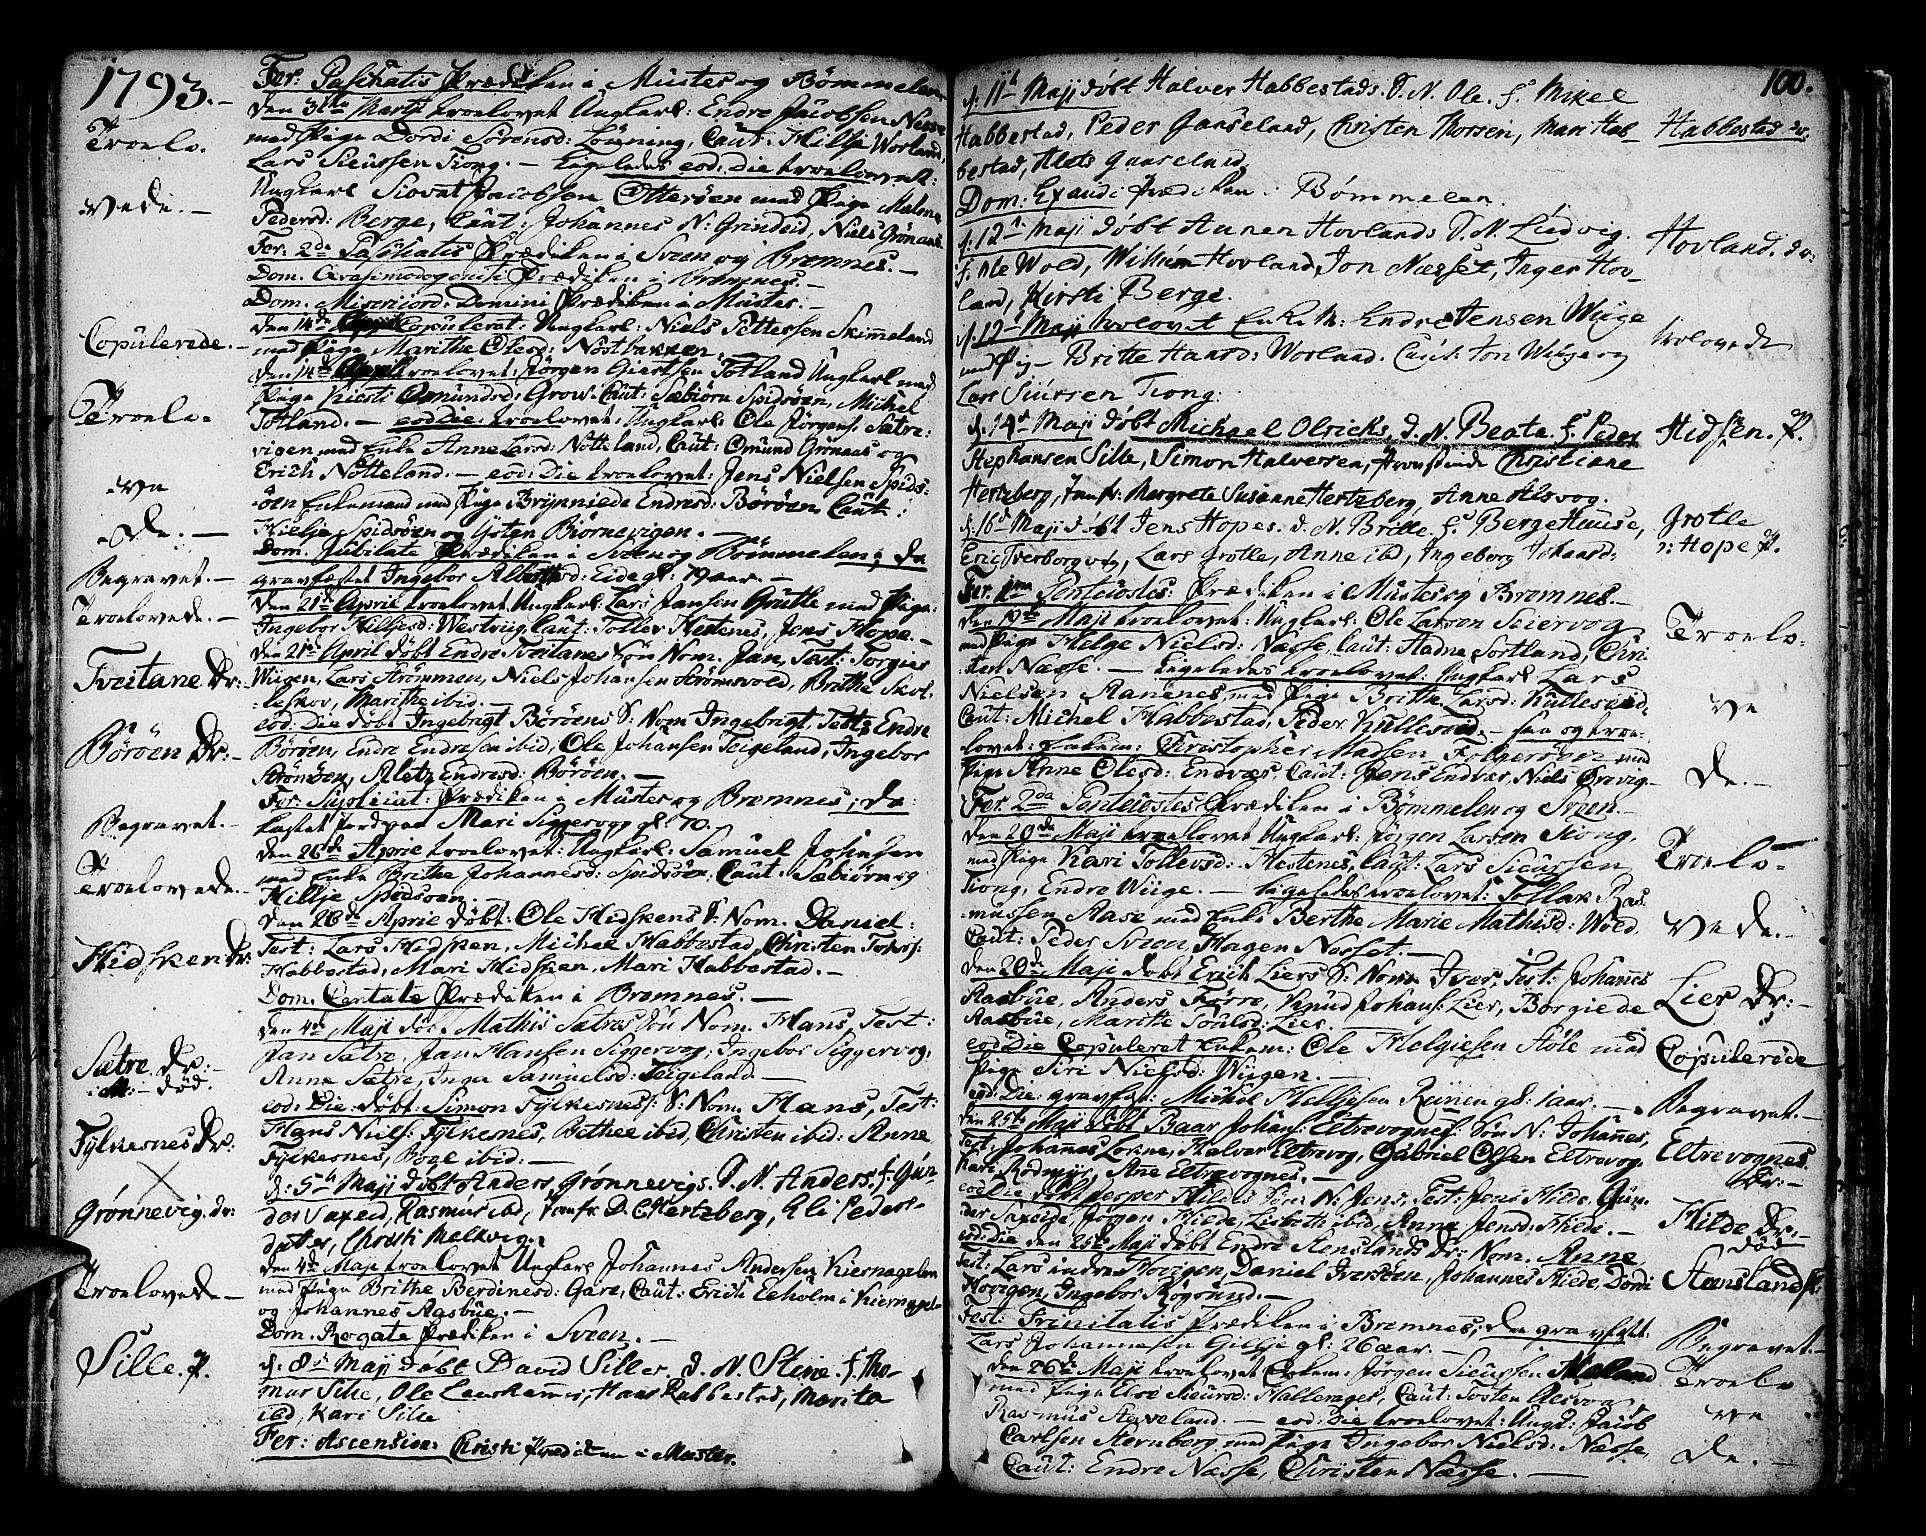 SAB, Finnås sokneprestembete, H/Ha/Haa/Haaa/L0003: Ministerialbok nr. A 3, 1765-1803, s. 100